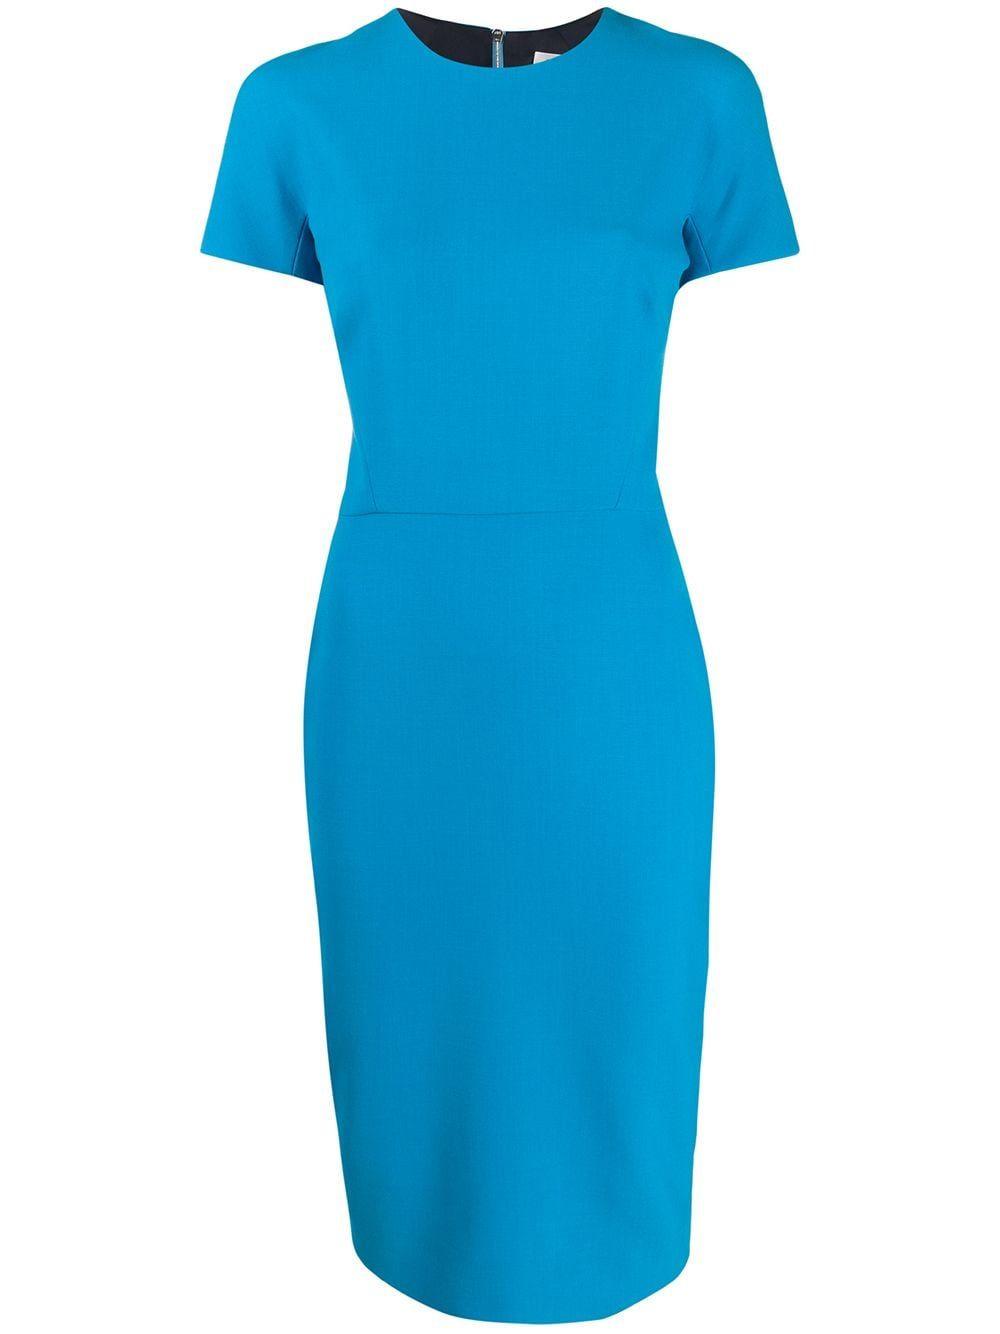 Victoria Beckham Pencil Midi Dress Farfetch Midi Pencil Dress Turquoise Midi Dress Blue Midi Dress [ 1334 x 1000 Pixel ]